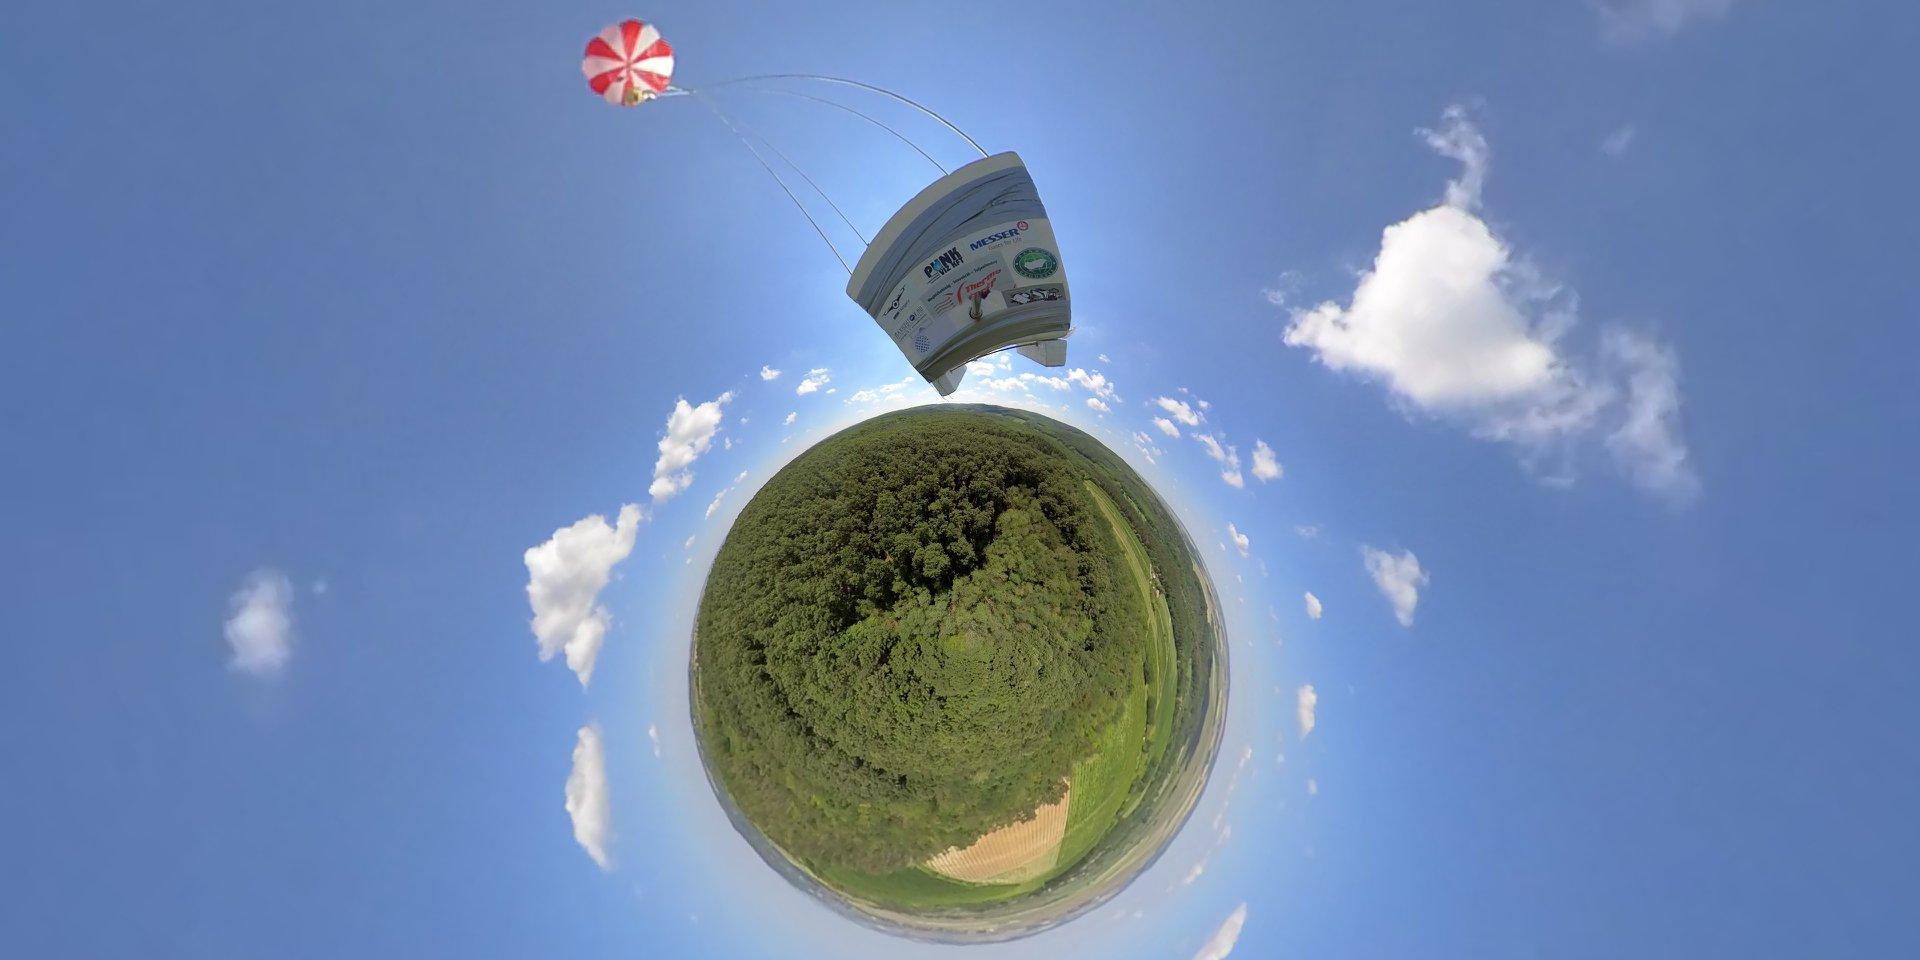 Űrbatyu II-high-altitude balloon-Hungary1